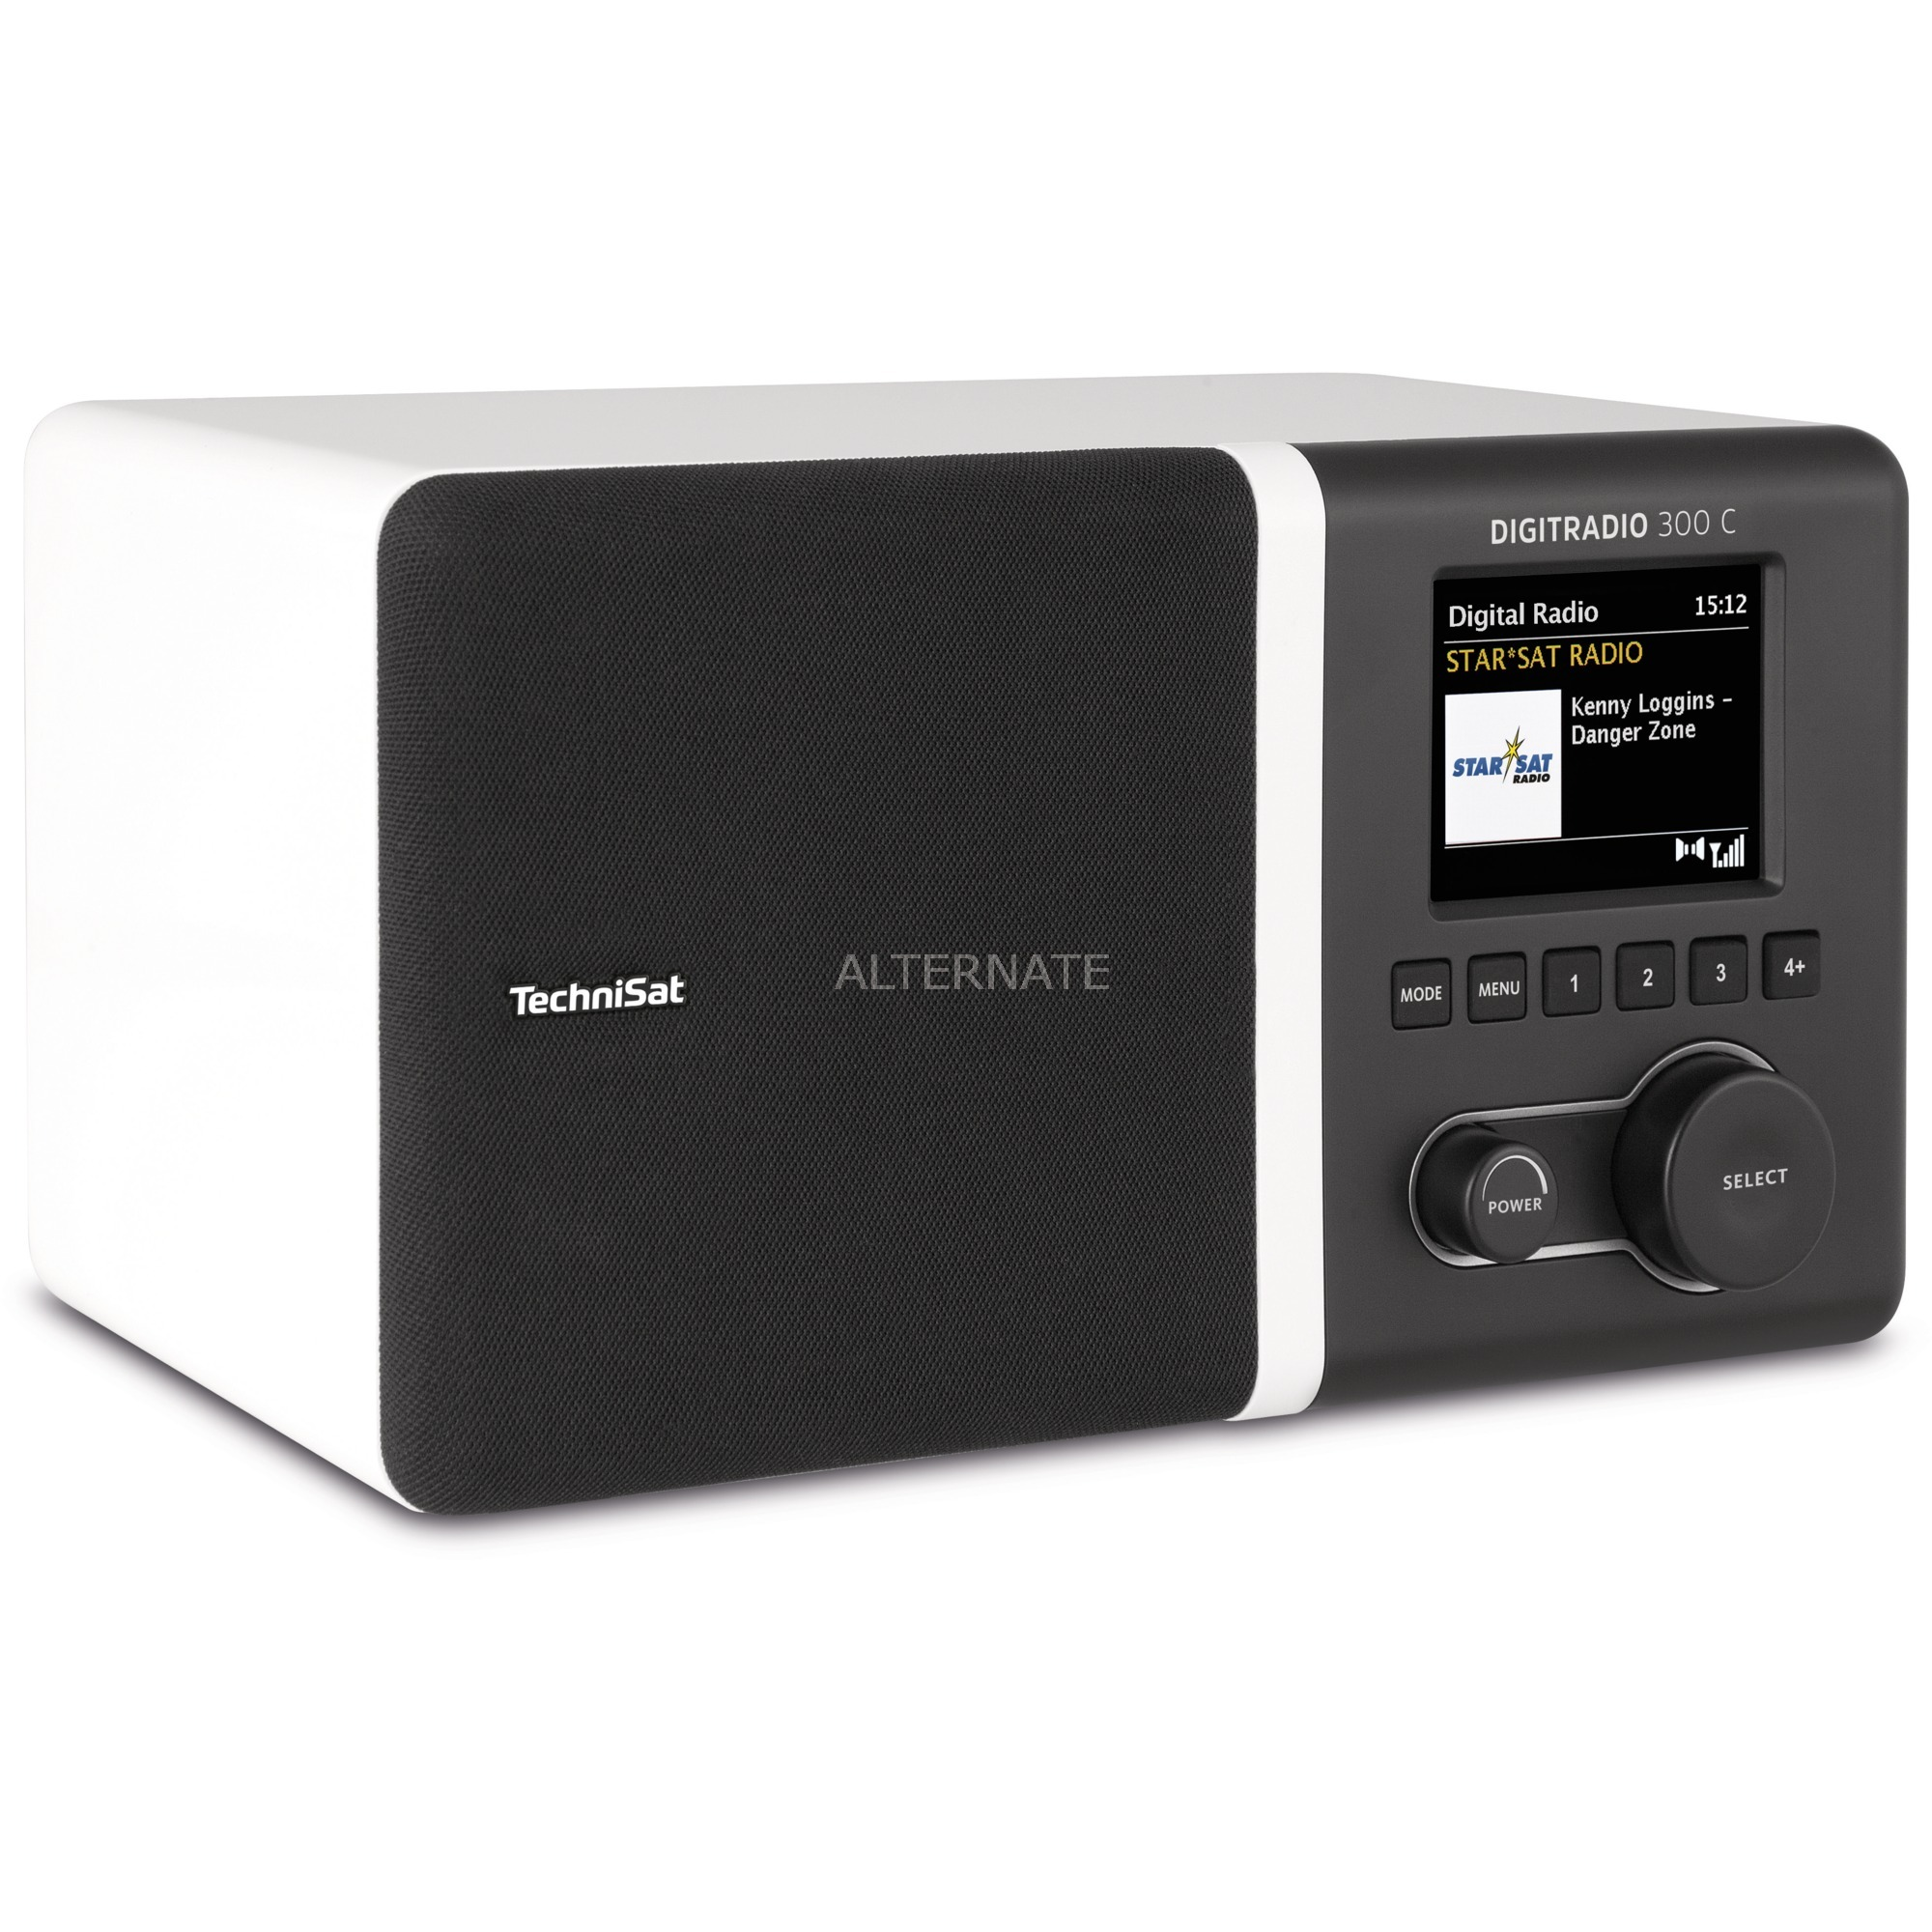 digitradio-300-c-barbar-analog-digital-hvid-radio